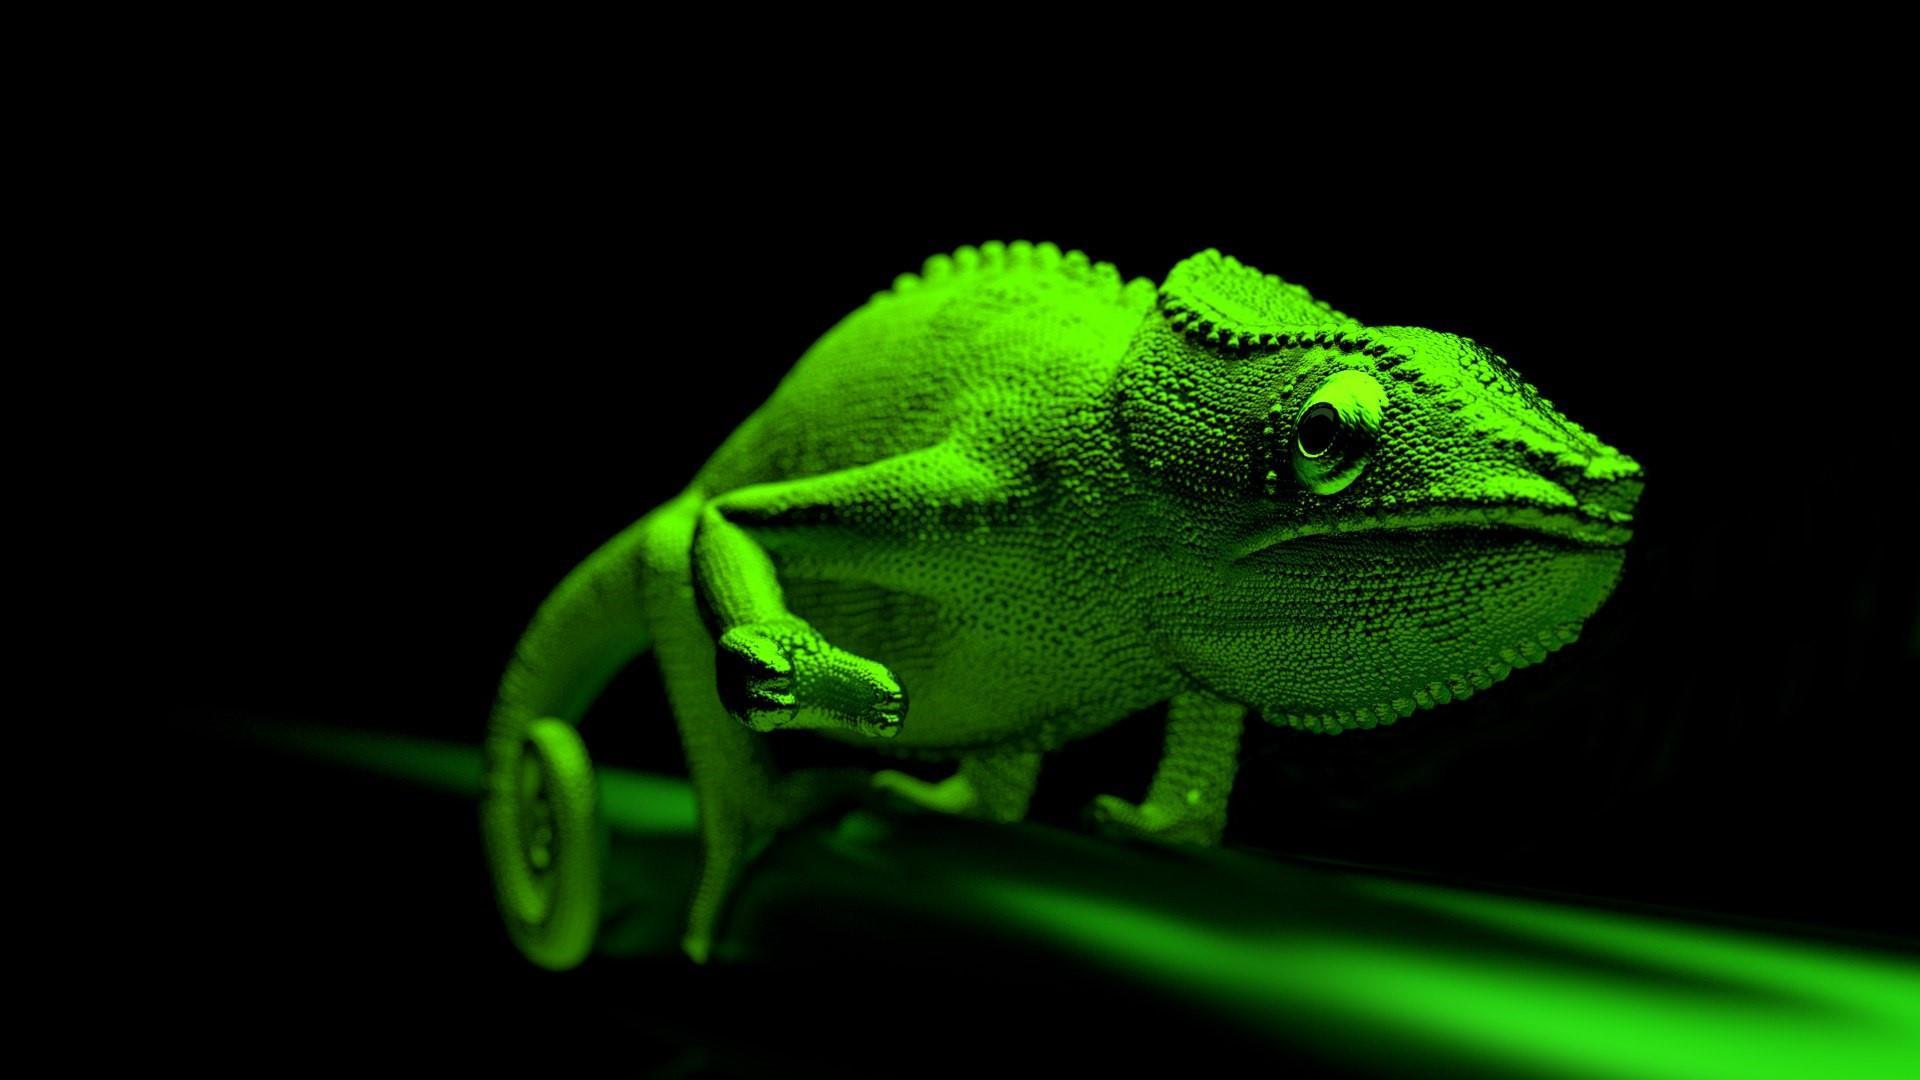 green chameleon - 3d computer graphics hd wallpaper